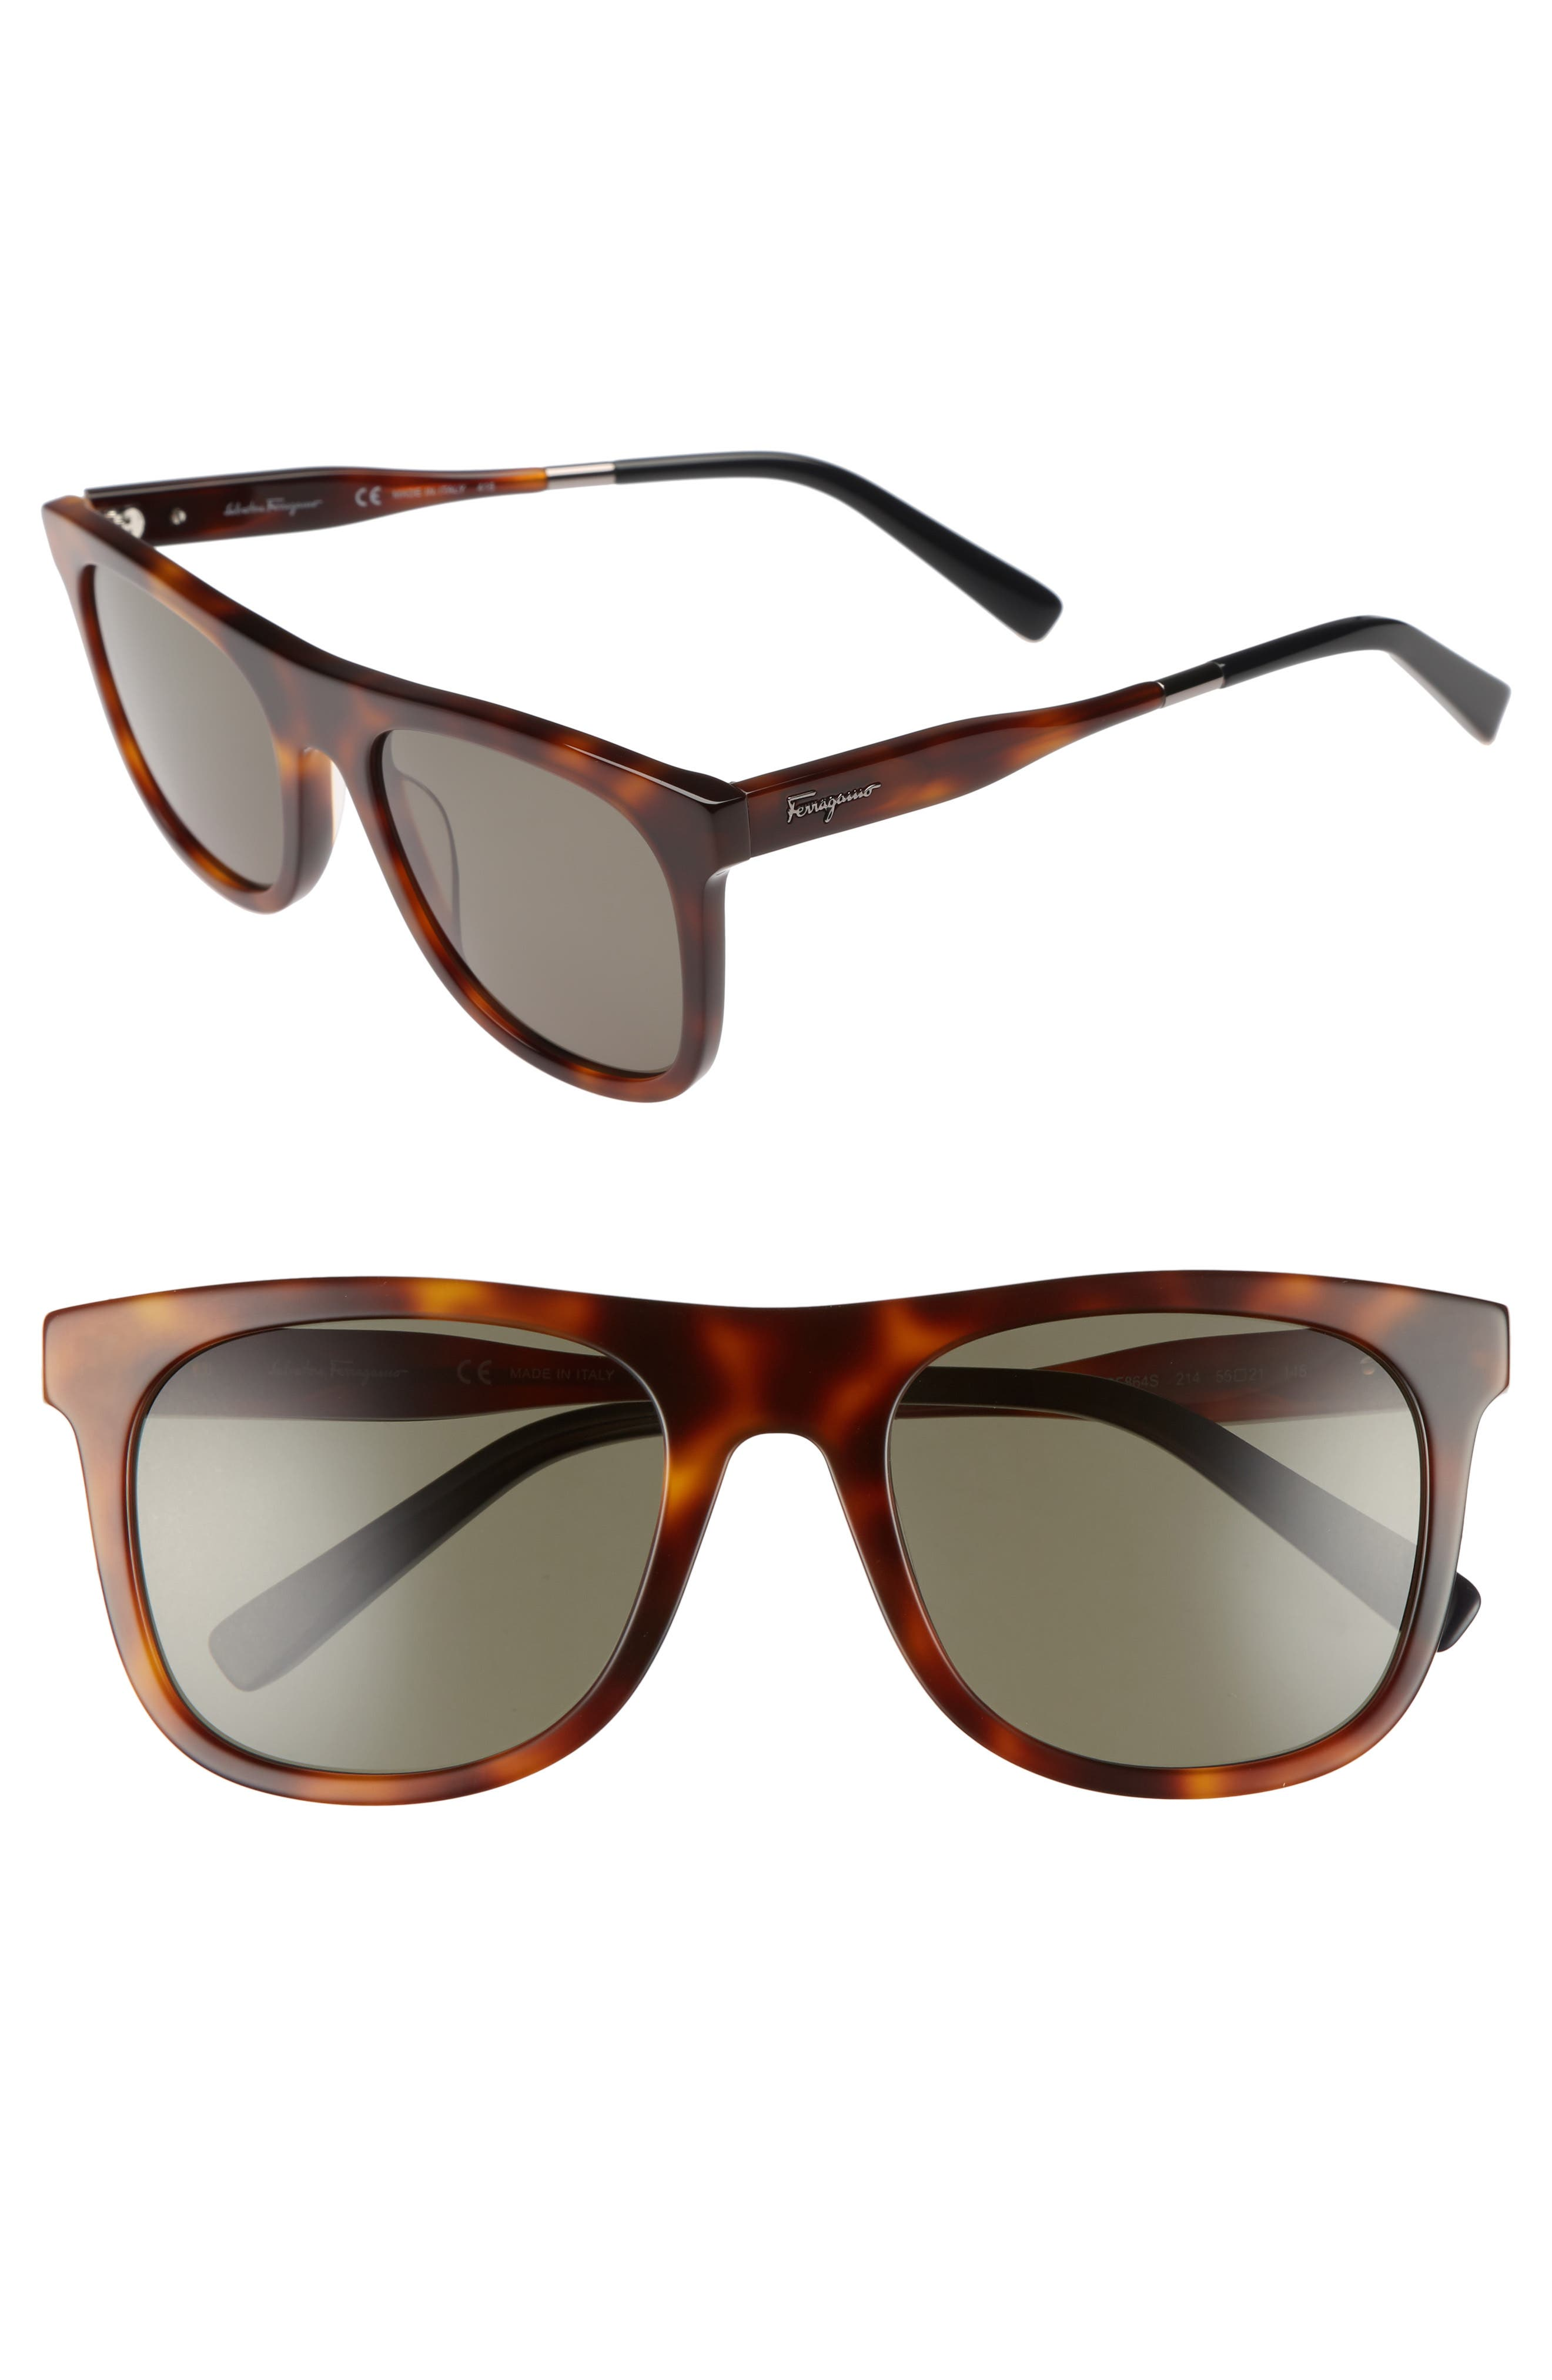 55mm Sunglasses,                             Main thumbnail 1, color,                             Tortoise